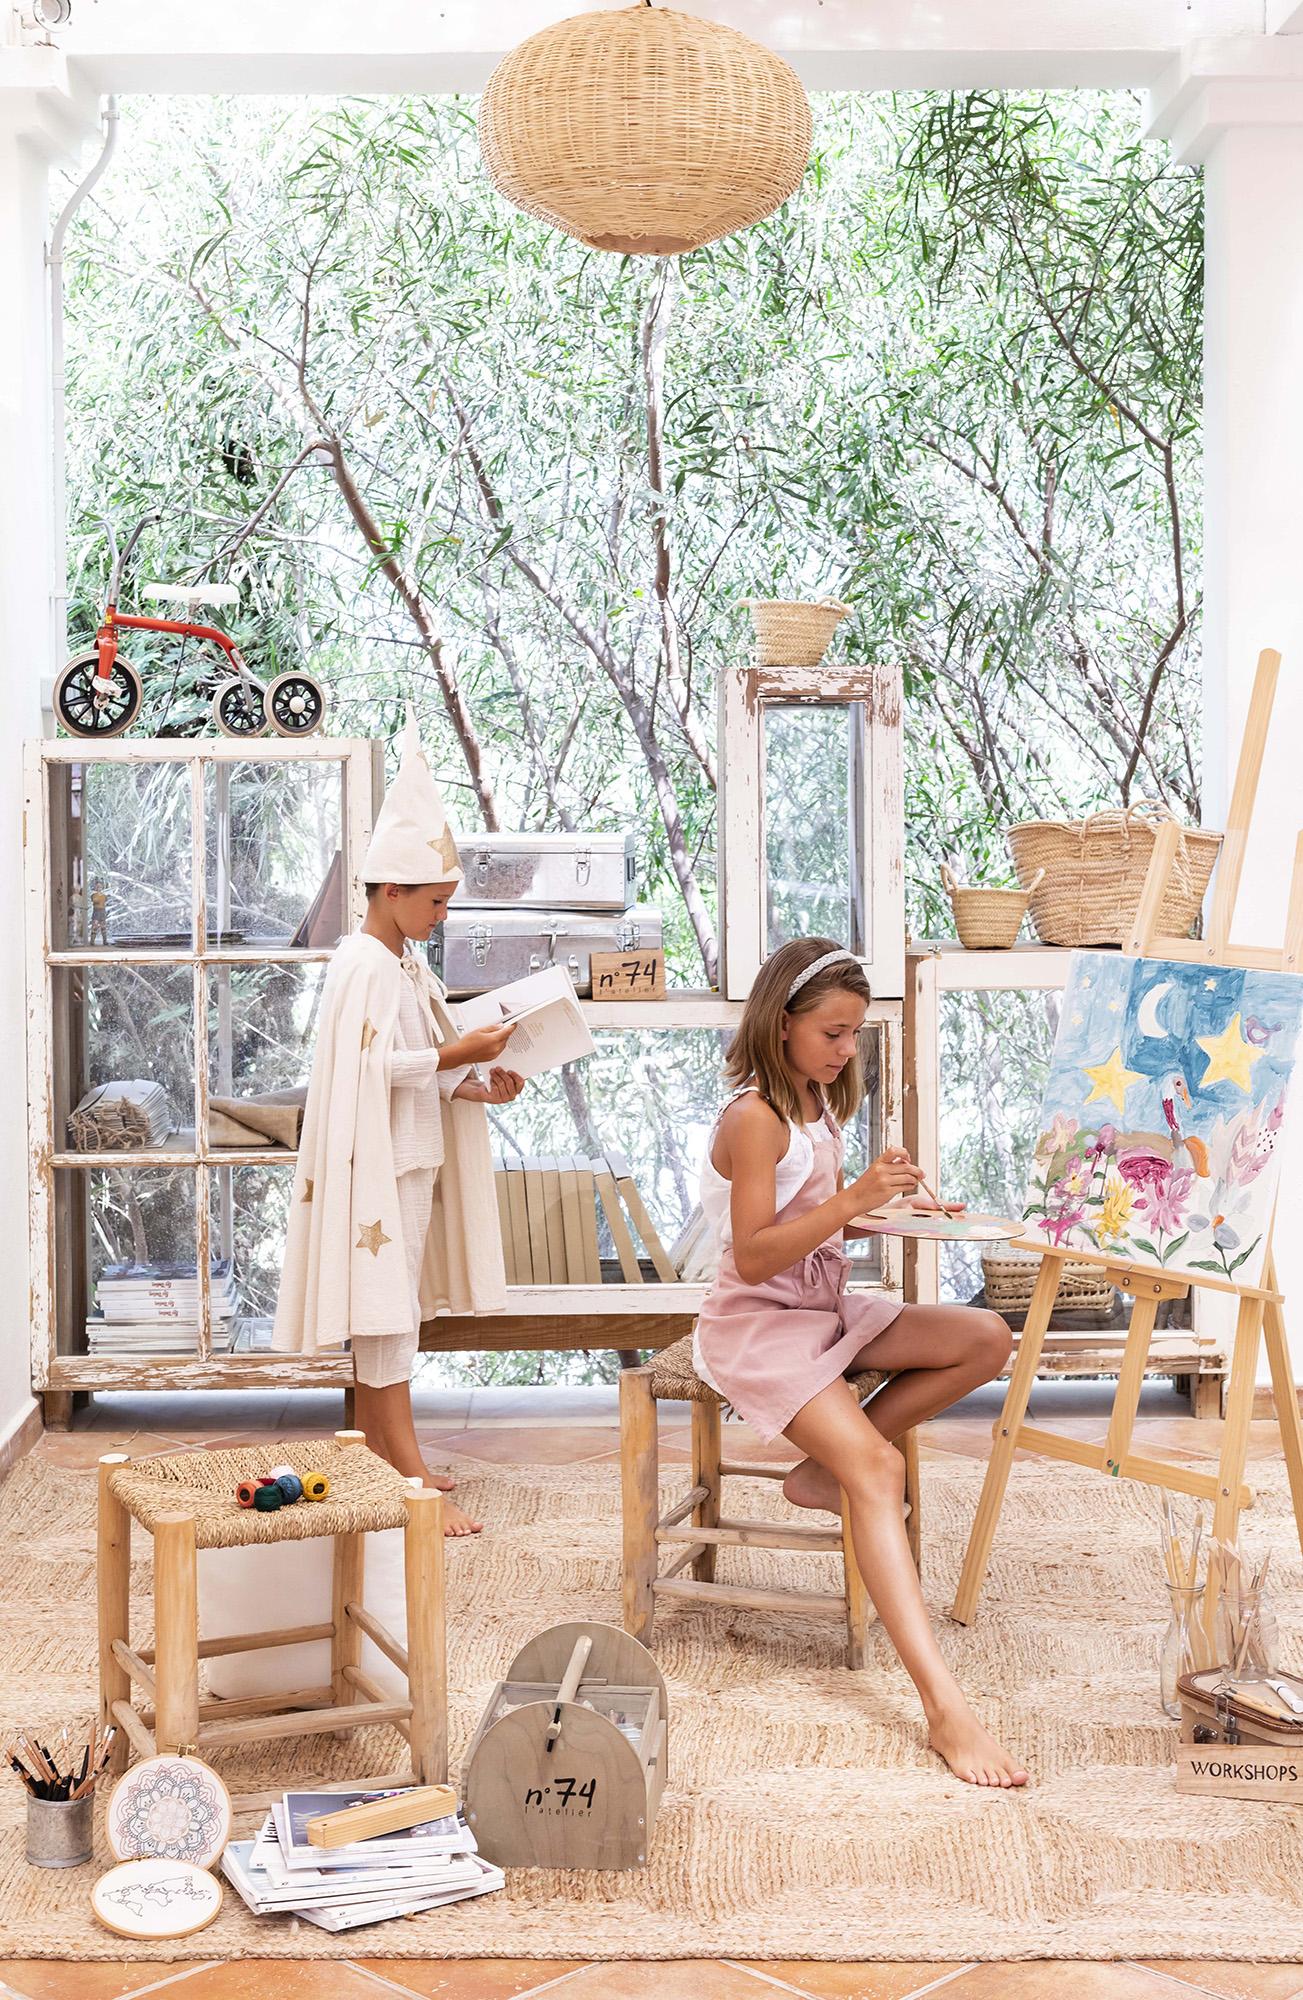 Maria Santos - Atelier 74 -fotógrafa - Ibiza - ibiza - livestyle - photogapher - artist - summer - abundance - gracias - Amsterdam - L'Atelier74